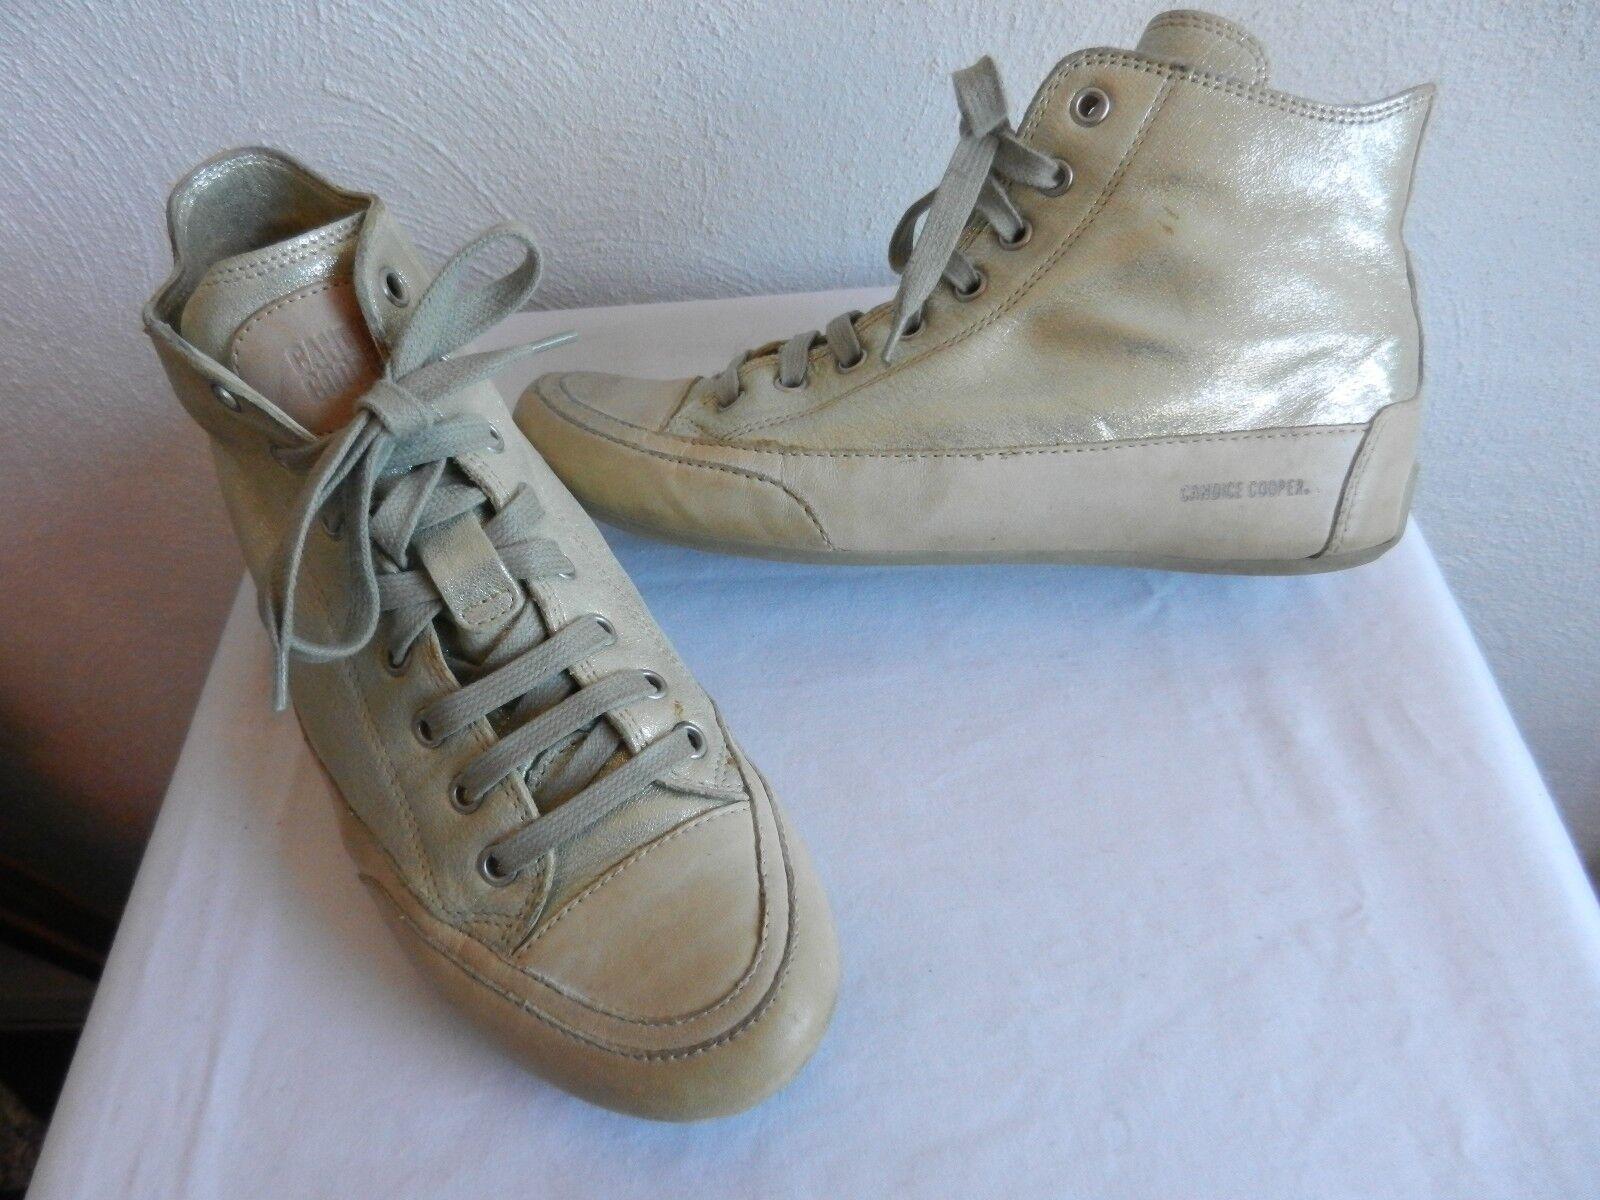 Candice Cooper Halbschuhe Sneaker Übergang Schuhe gold Metallic Gr. 37